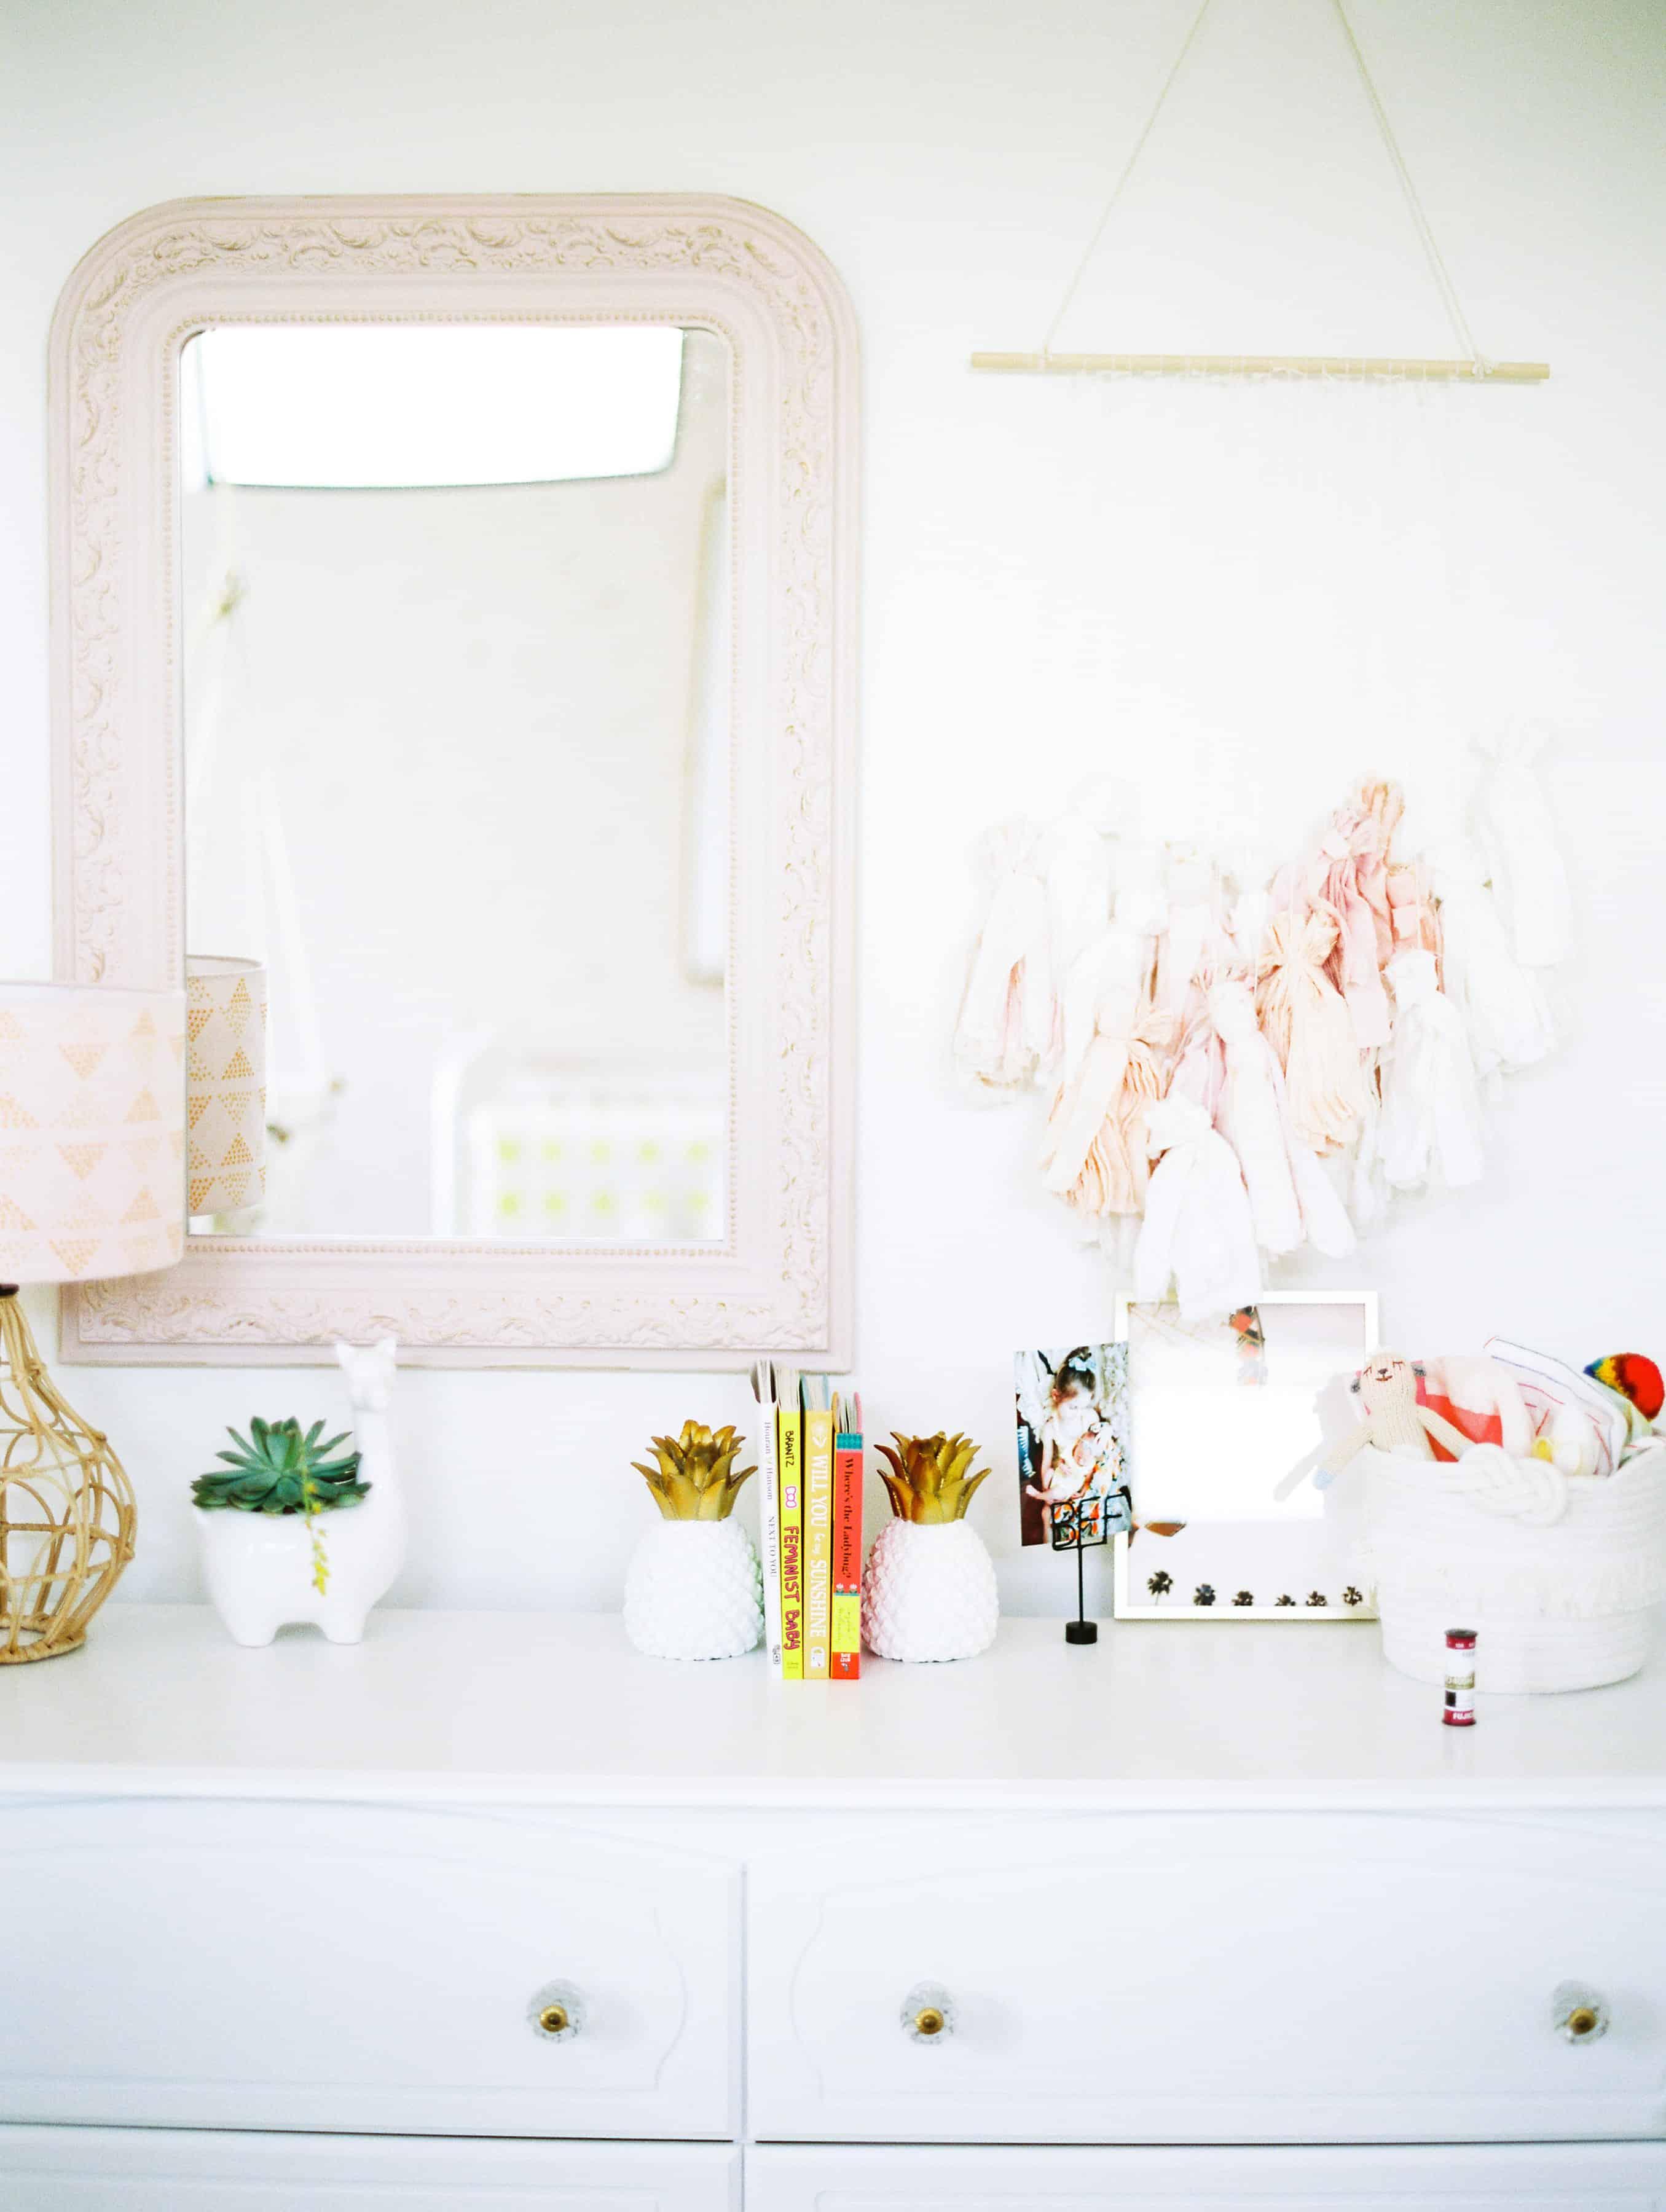 Boho Chic dresser decor in little girls nursery